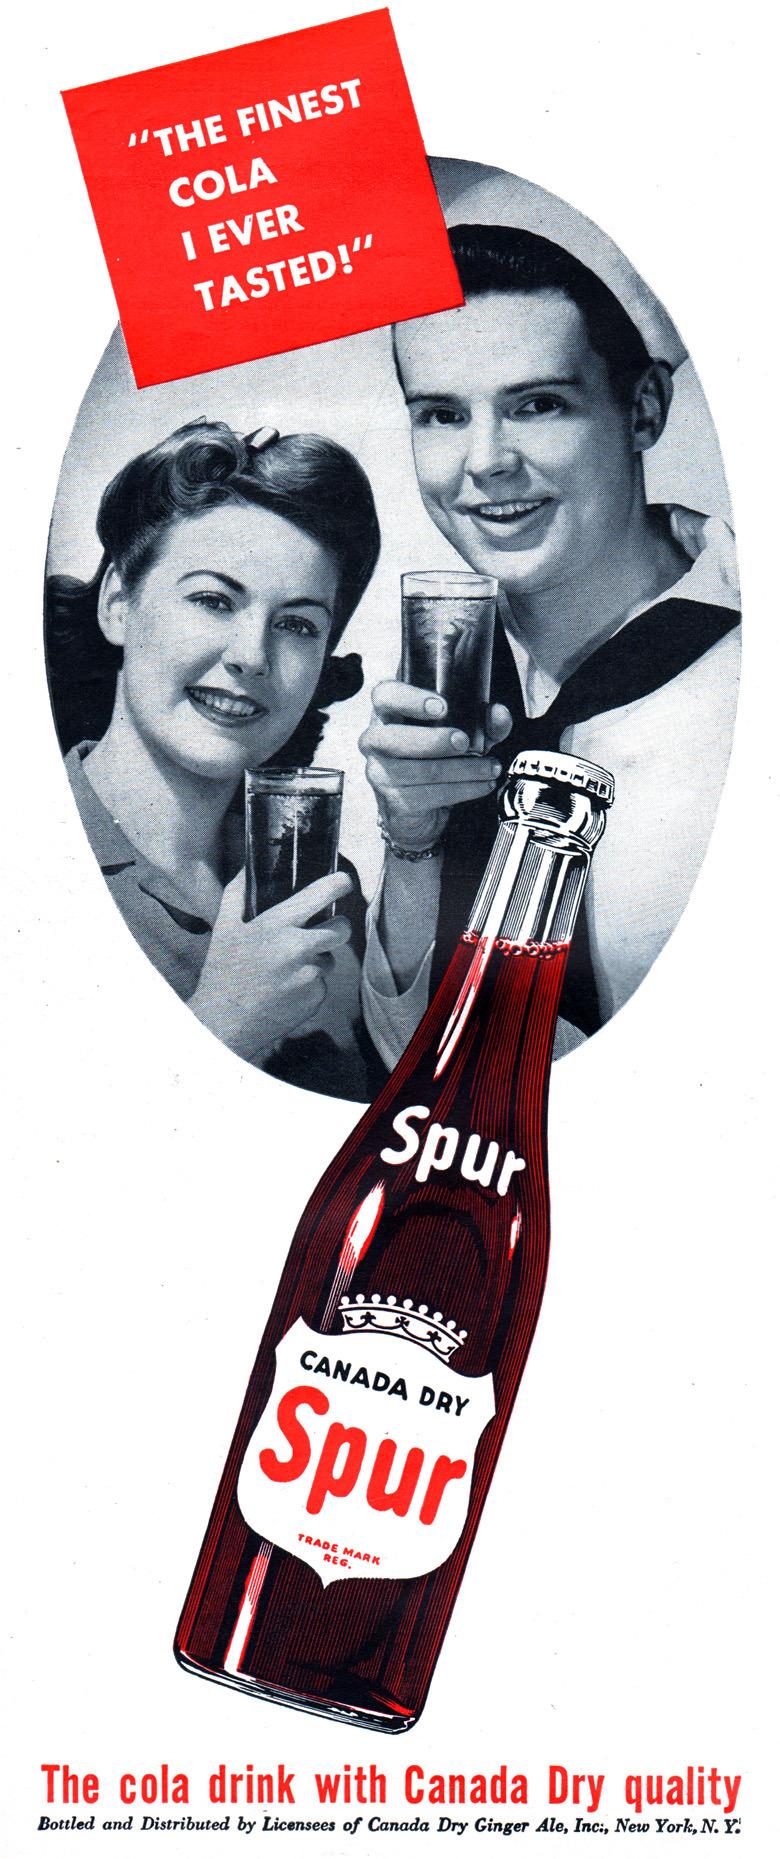 Canada Dry 'Spur' cola - 1943